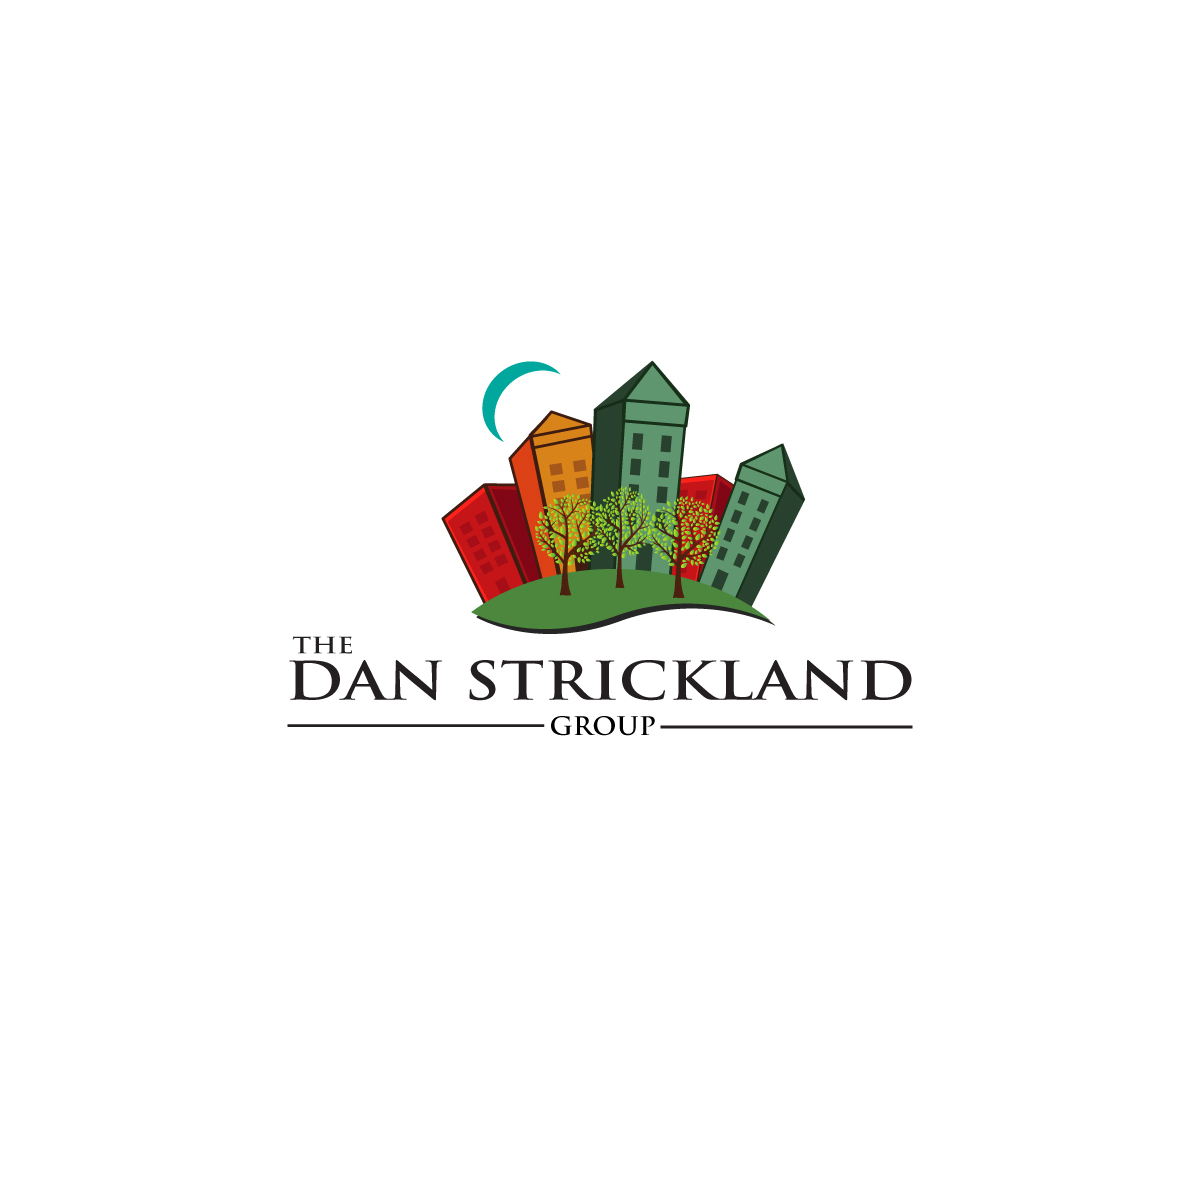 Logo Design by danelav - Entry No. 133 in the Logo Design Contest Creative Logo Design for The Dan Strickland Group.